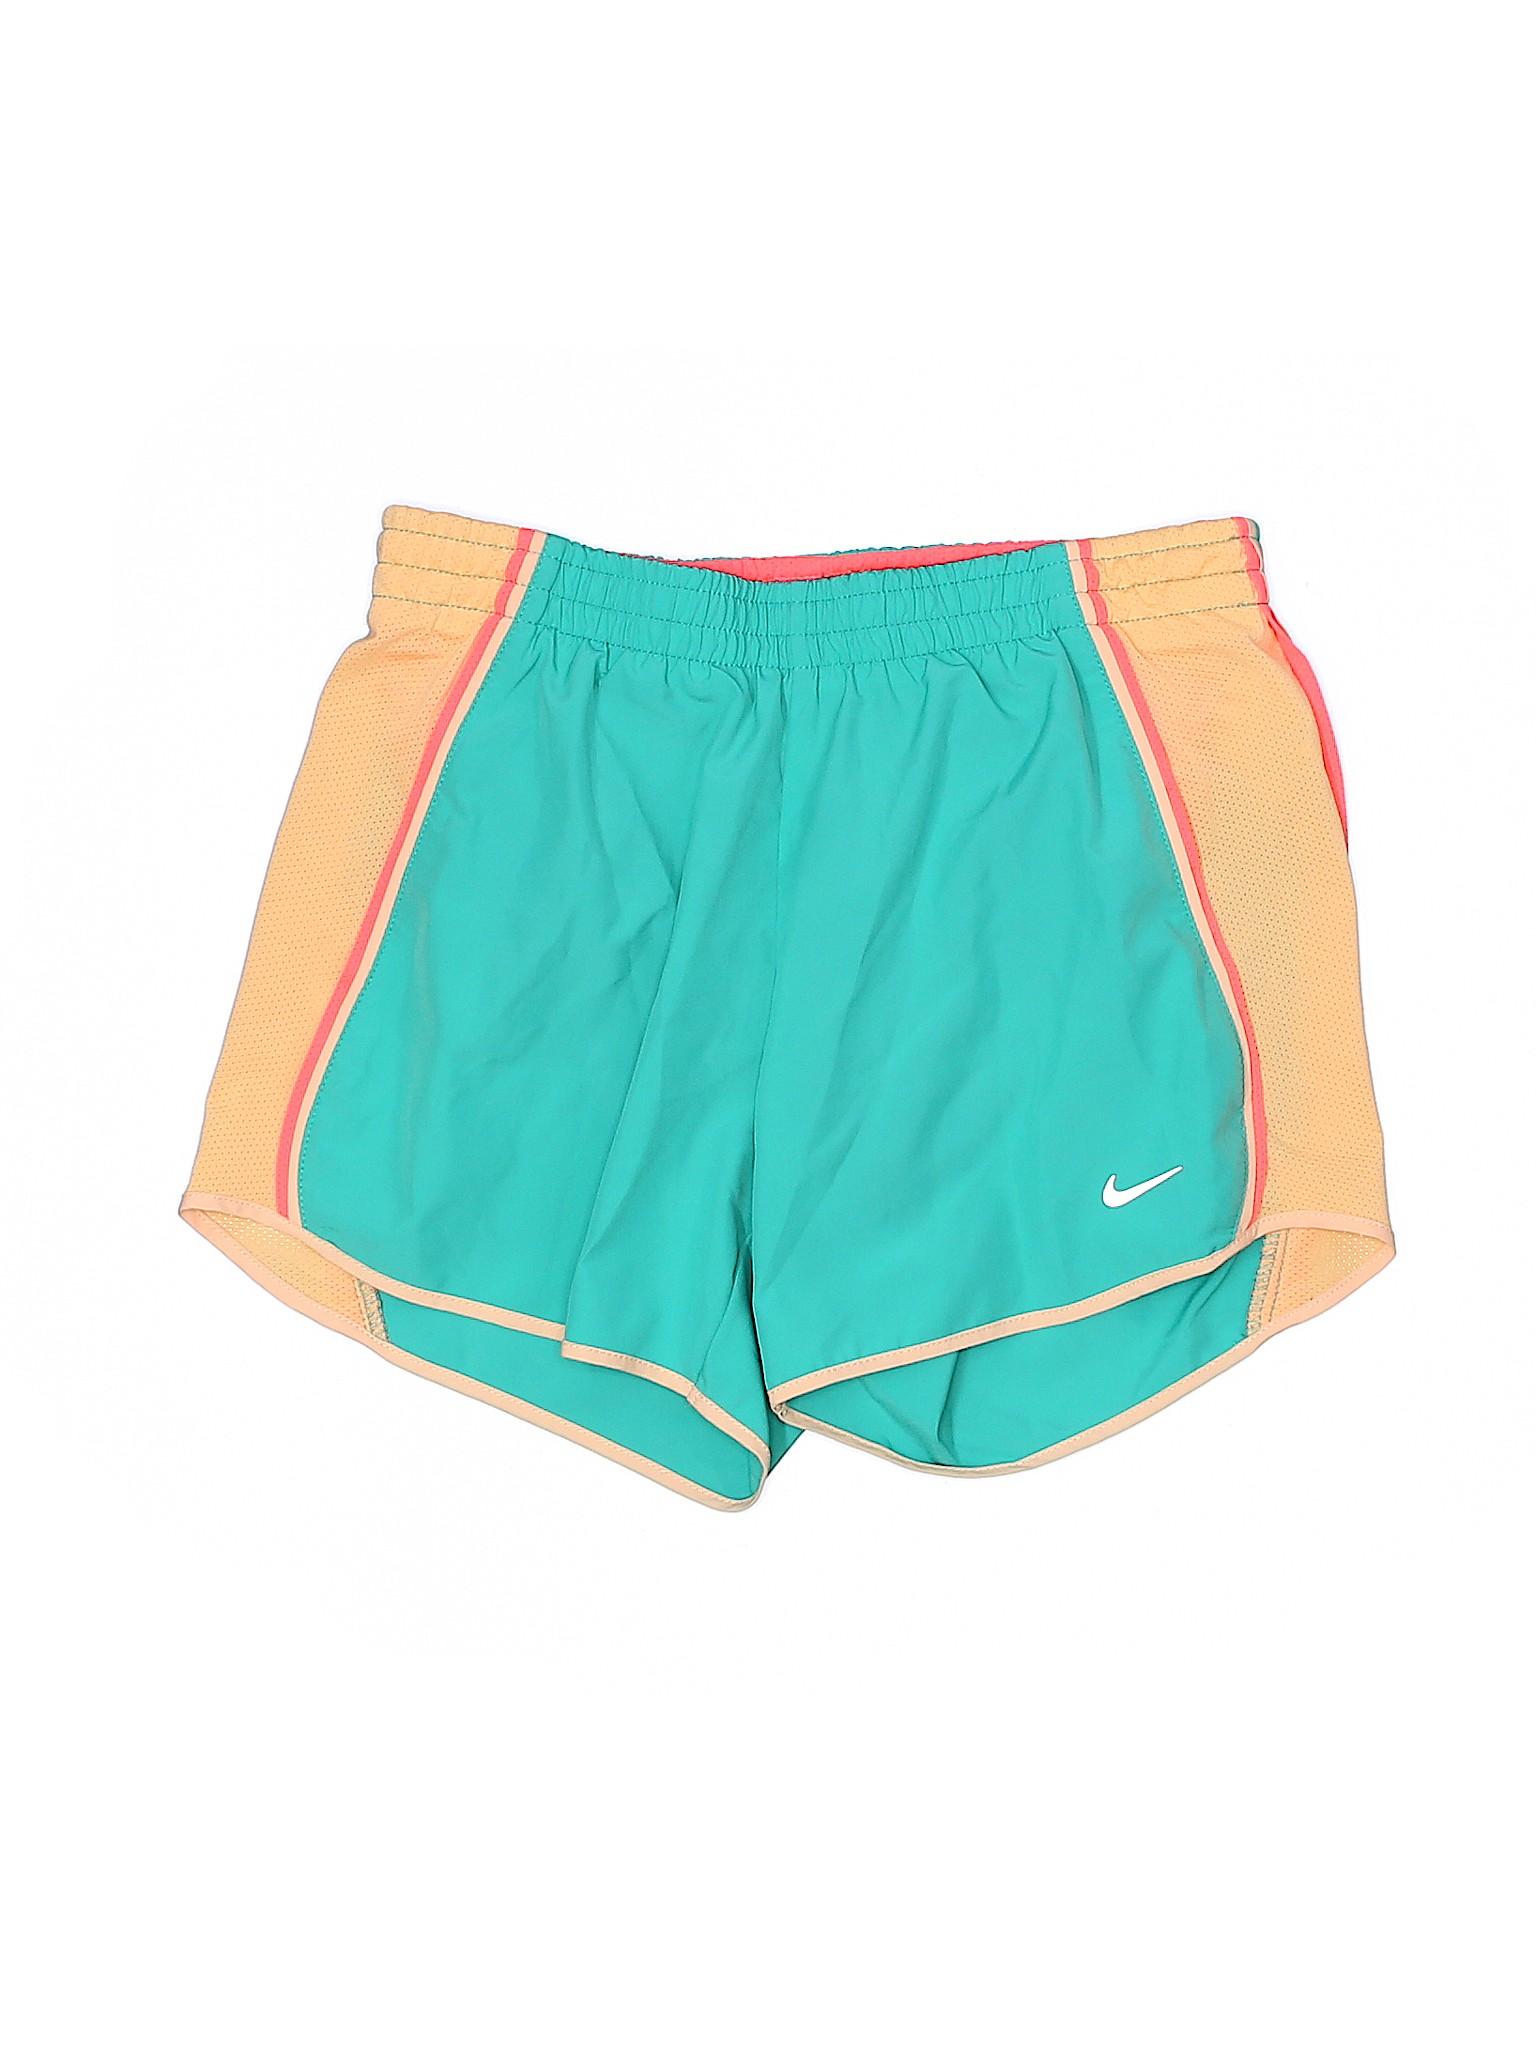 Shorts Nike Boutique Boutique Nike Boutique Shorts Shorts Nike Boutique Shorts Shorts Nike Boutique Nike 6qEF4Cw